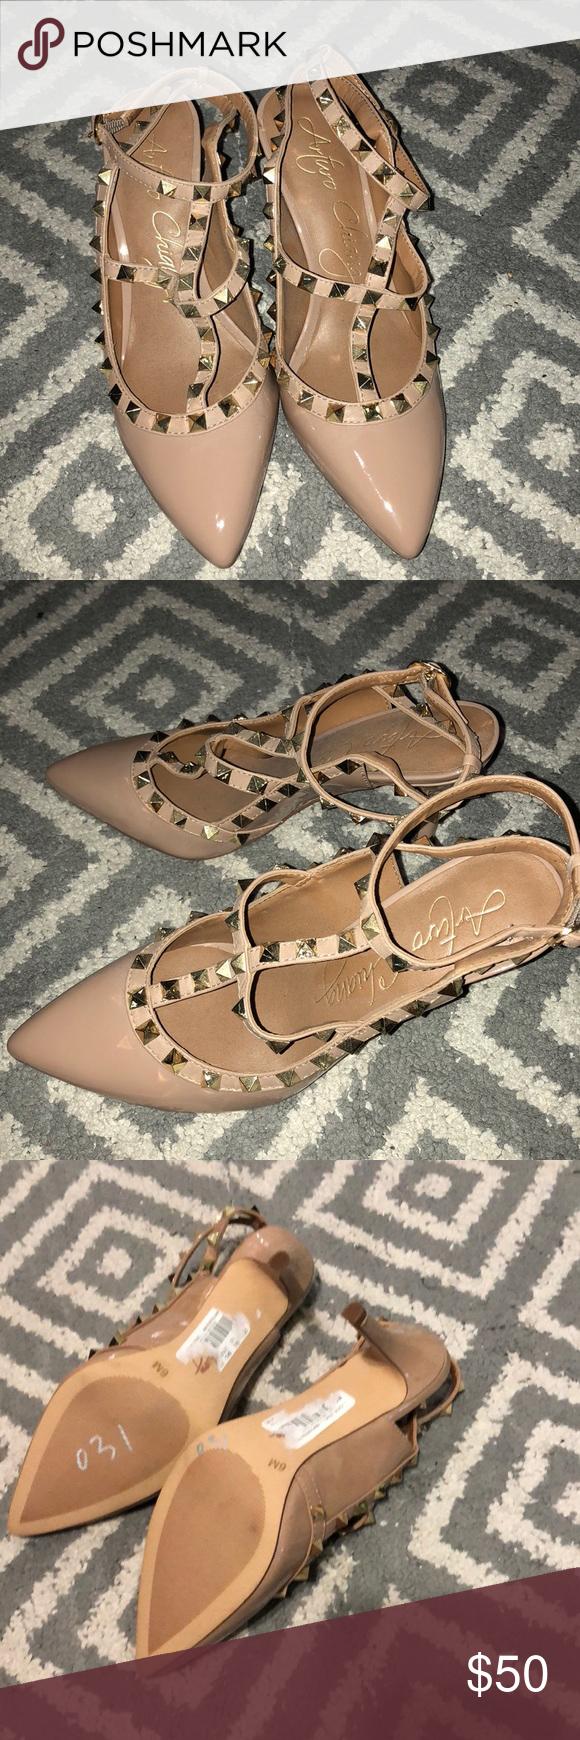 27384202ae8d Brand new Arturo Chiangmai studded heels Never worn